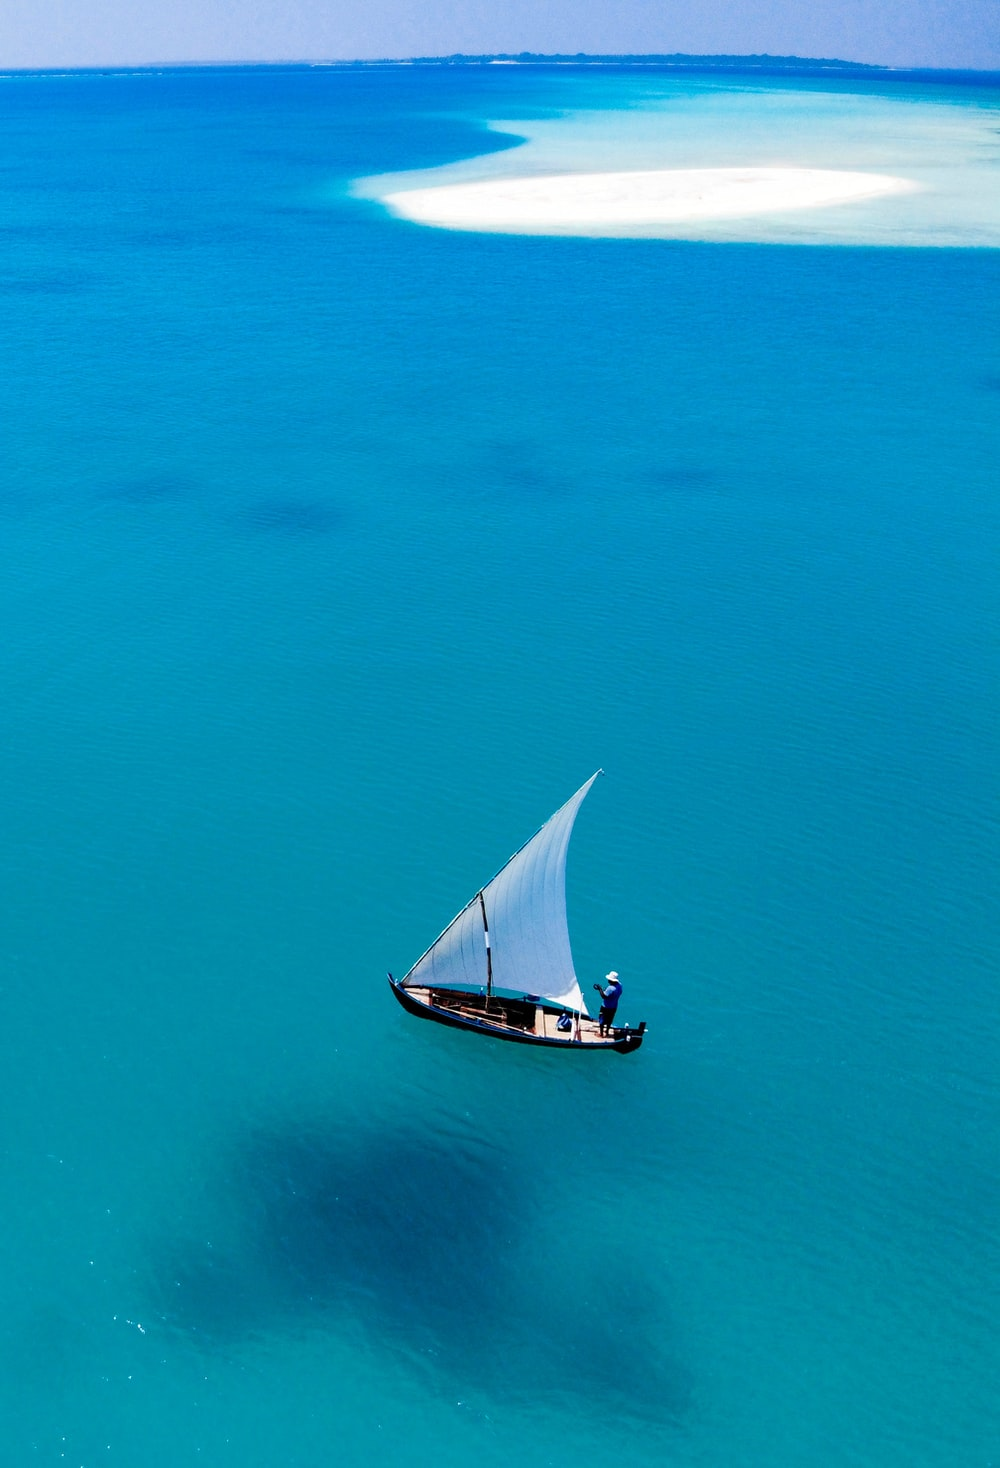 white and black sailboat on blue sea